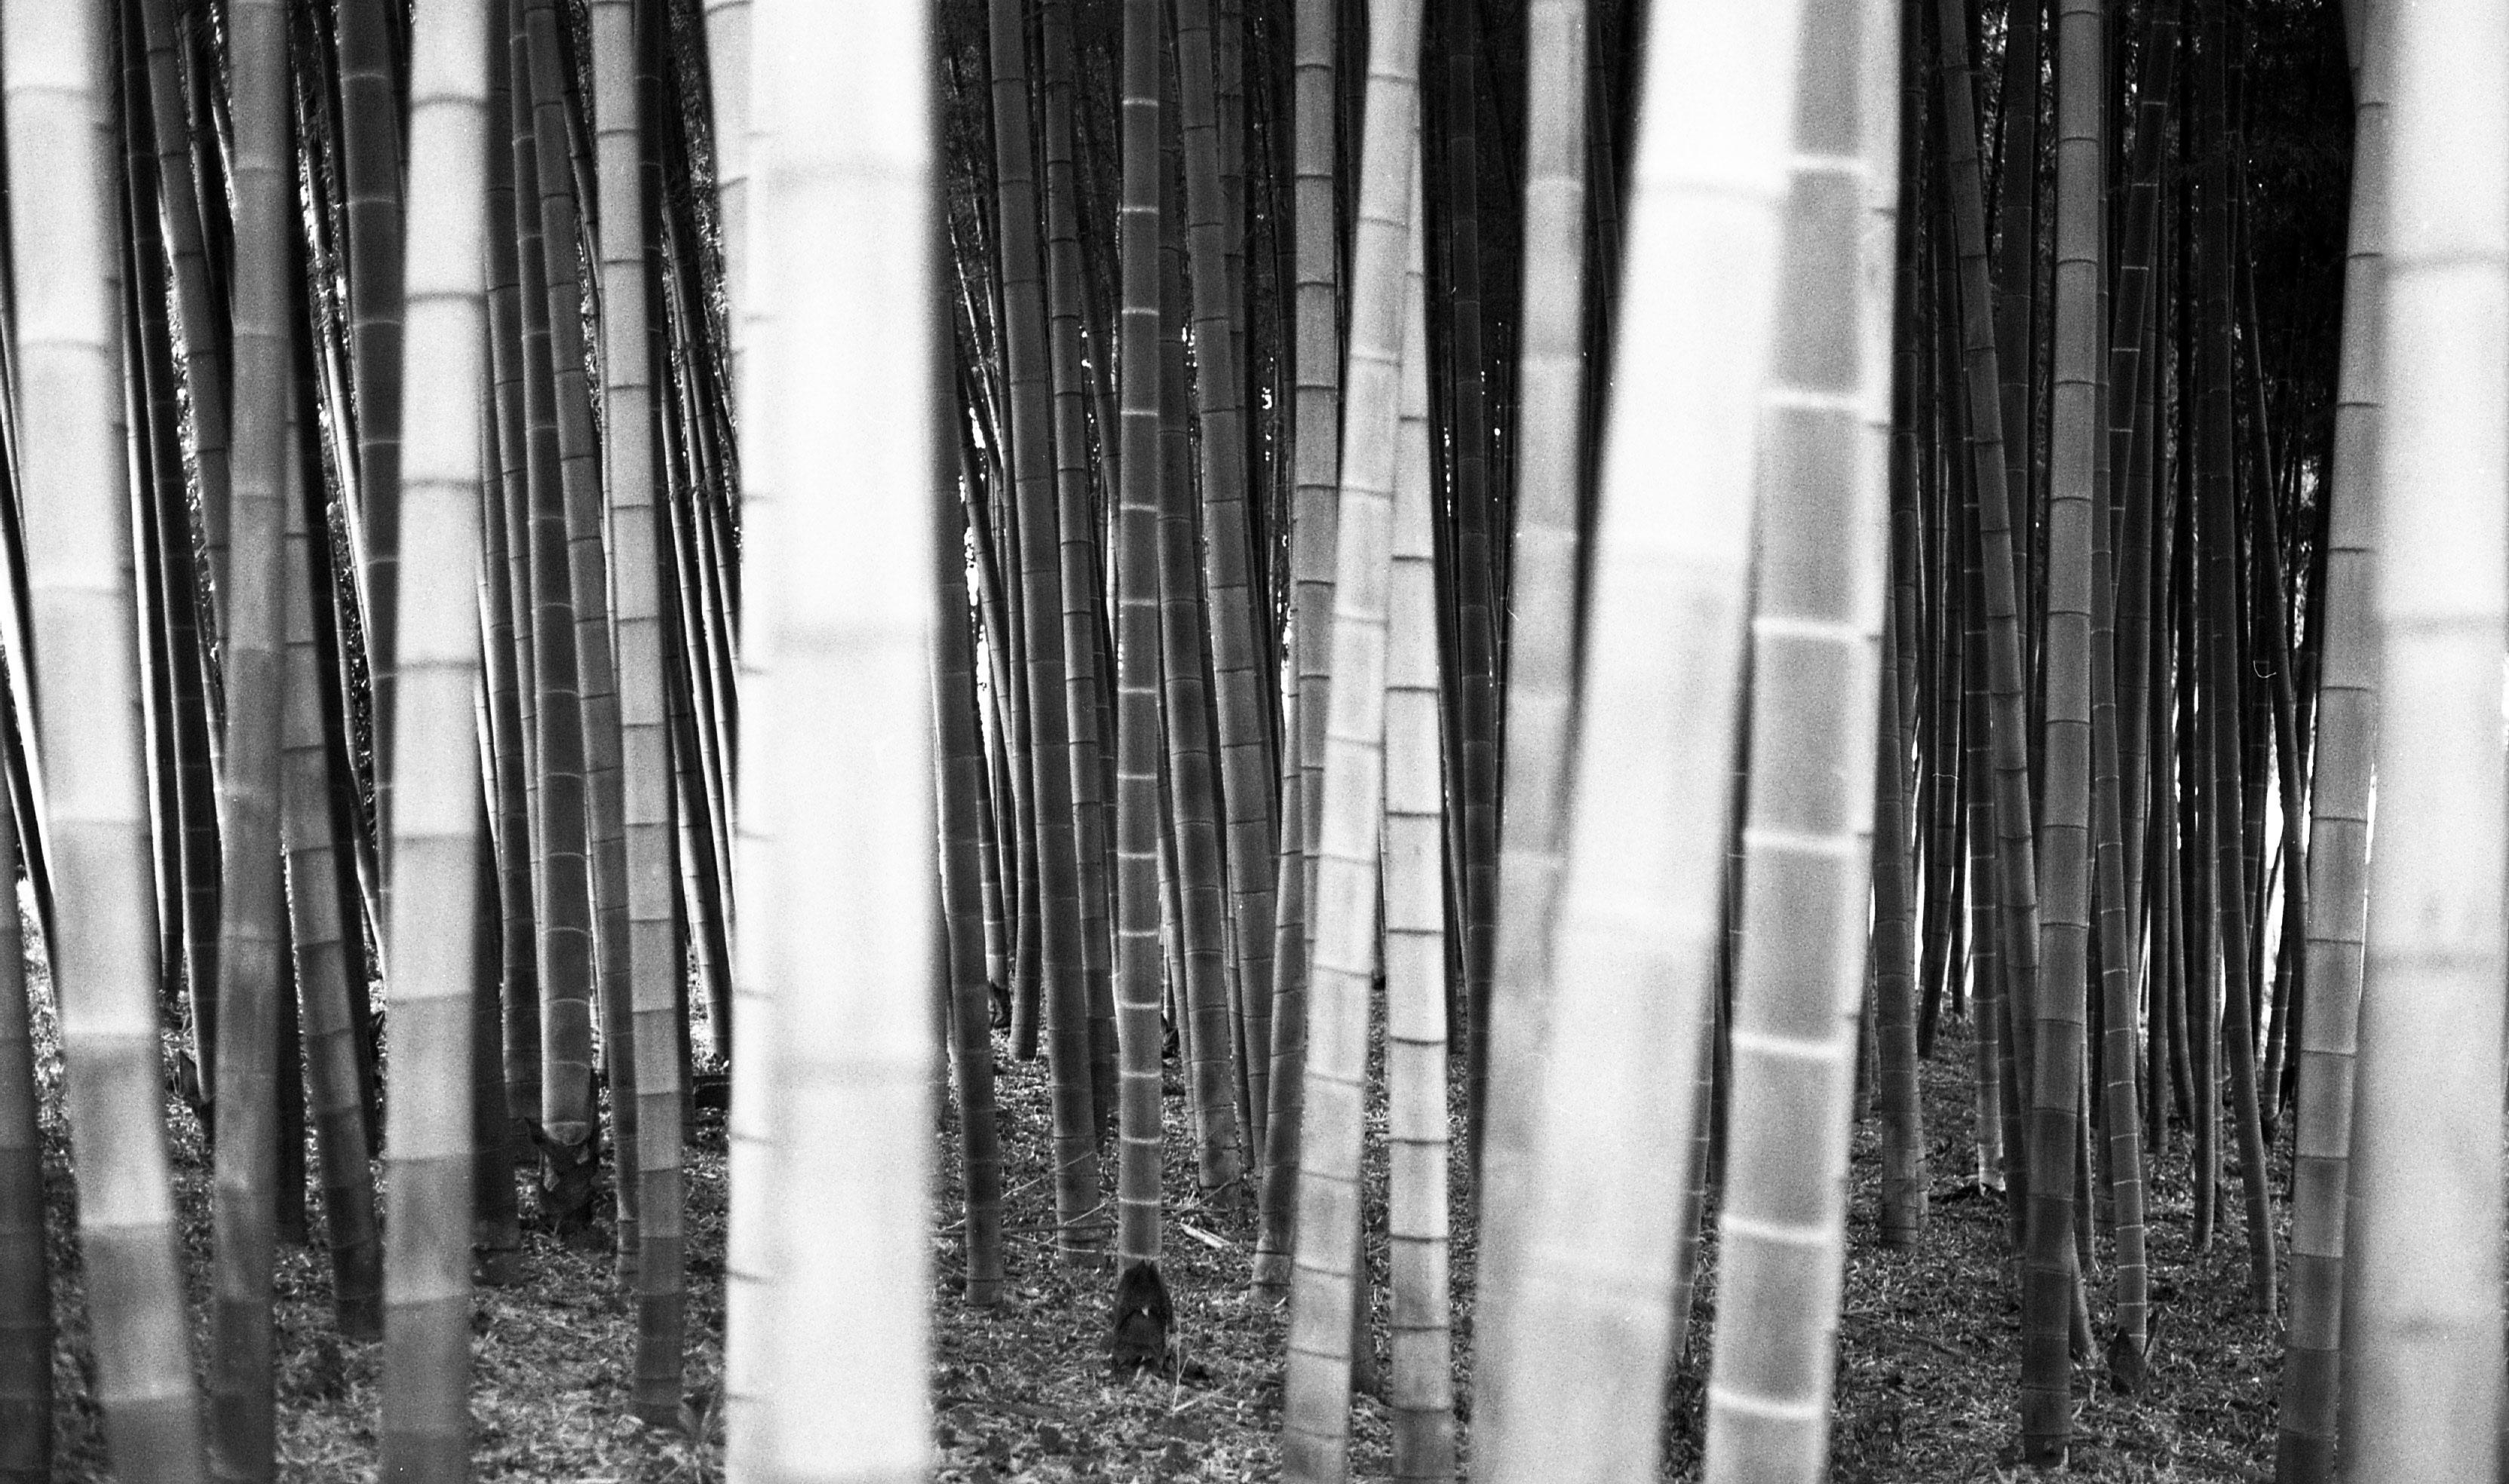 Bamboo Season